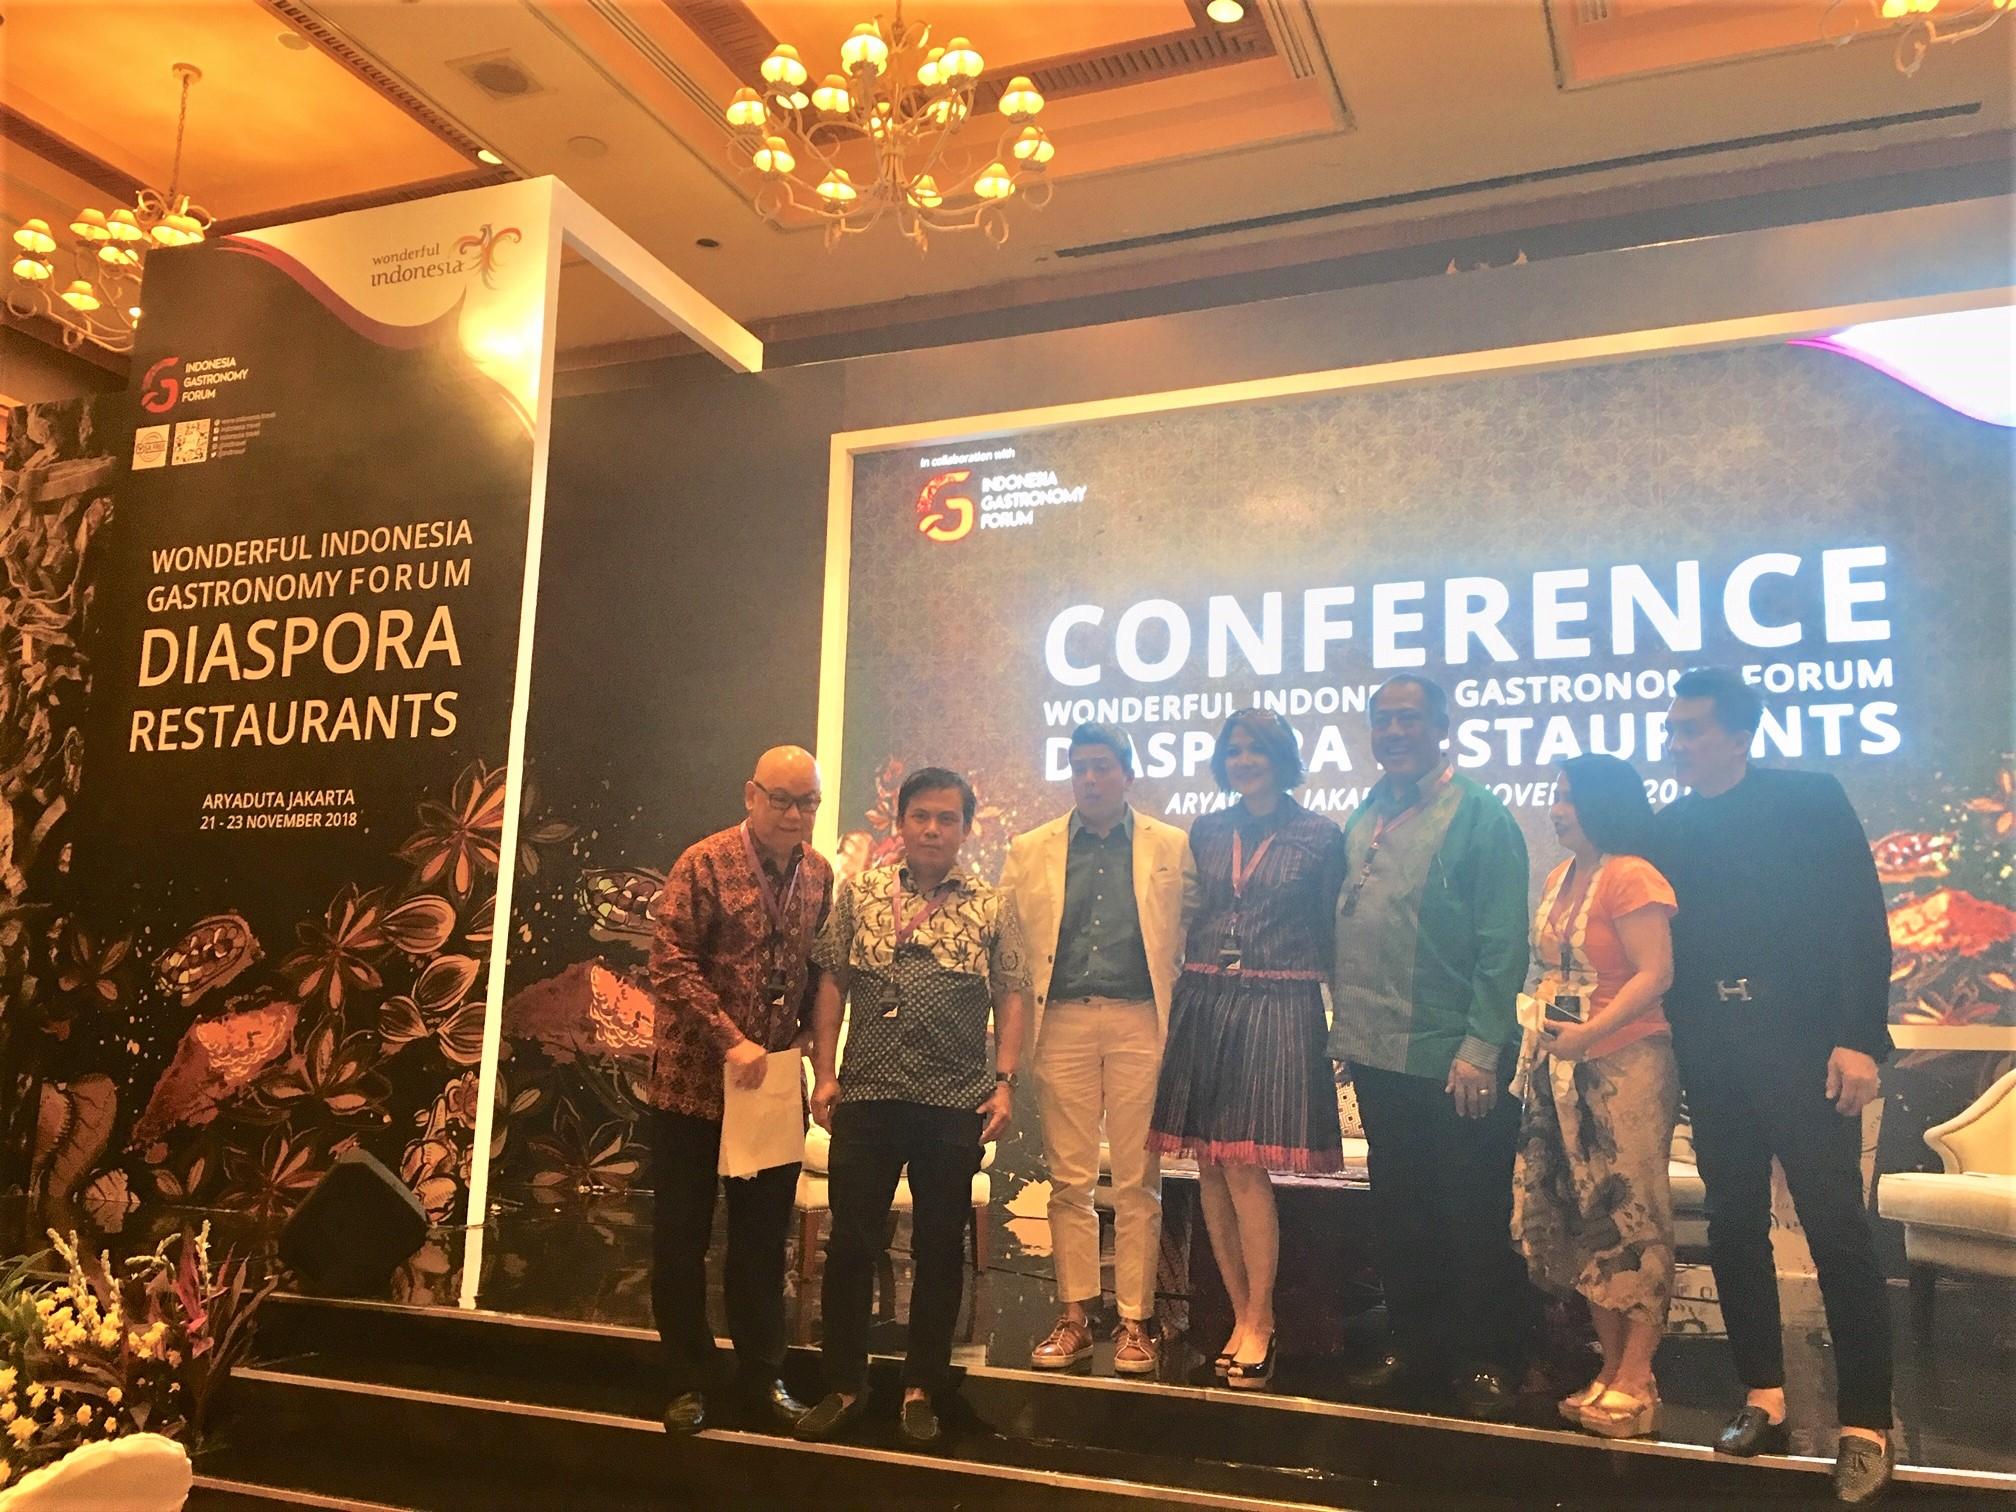 Pembicara di Wonderful Indonesia Gastronomy Forum Diaspora Restaurants | Foto: IDBC